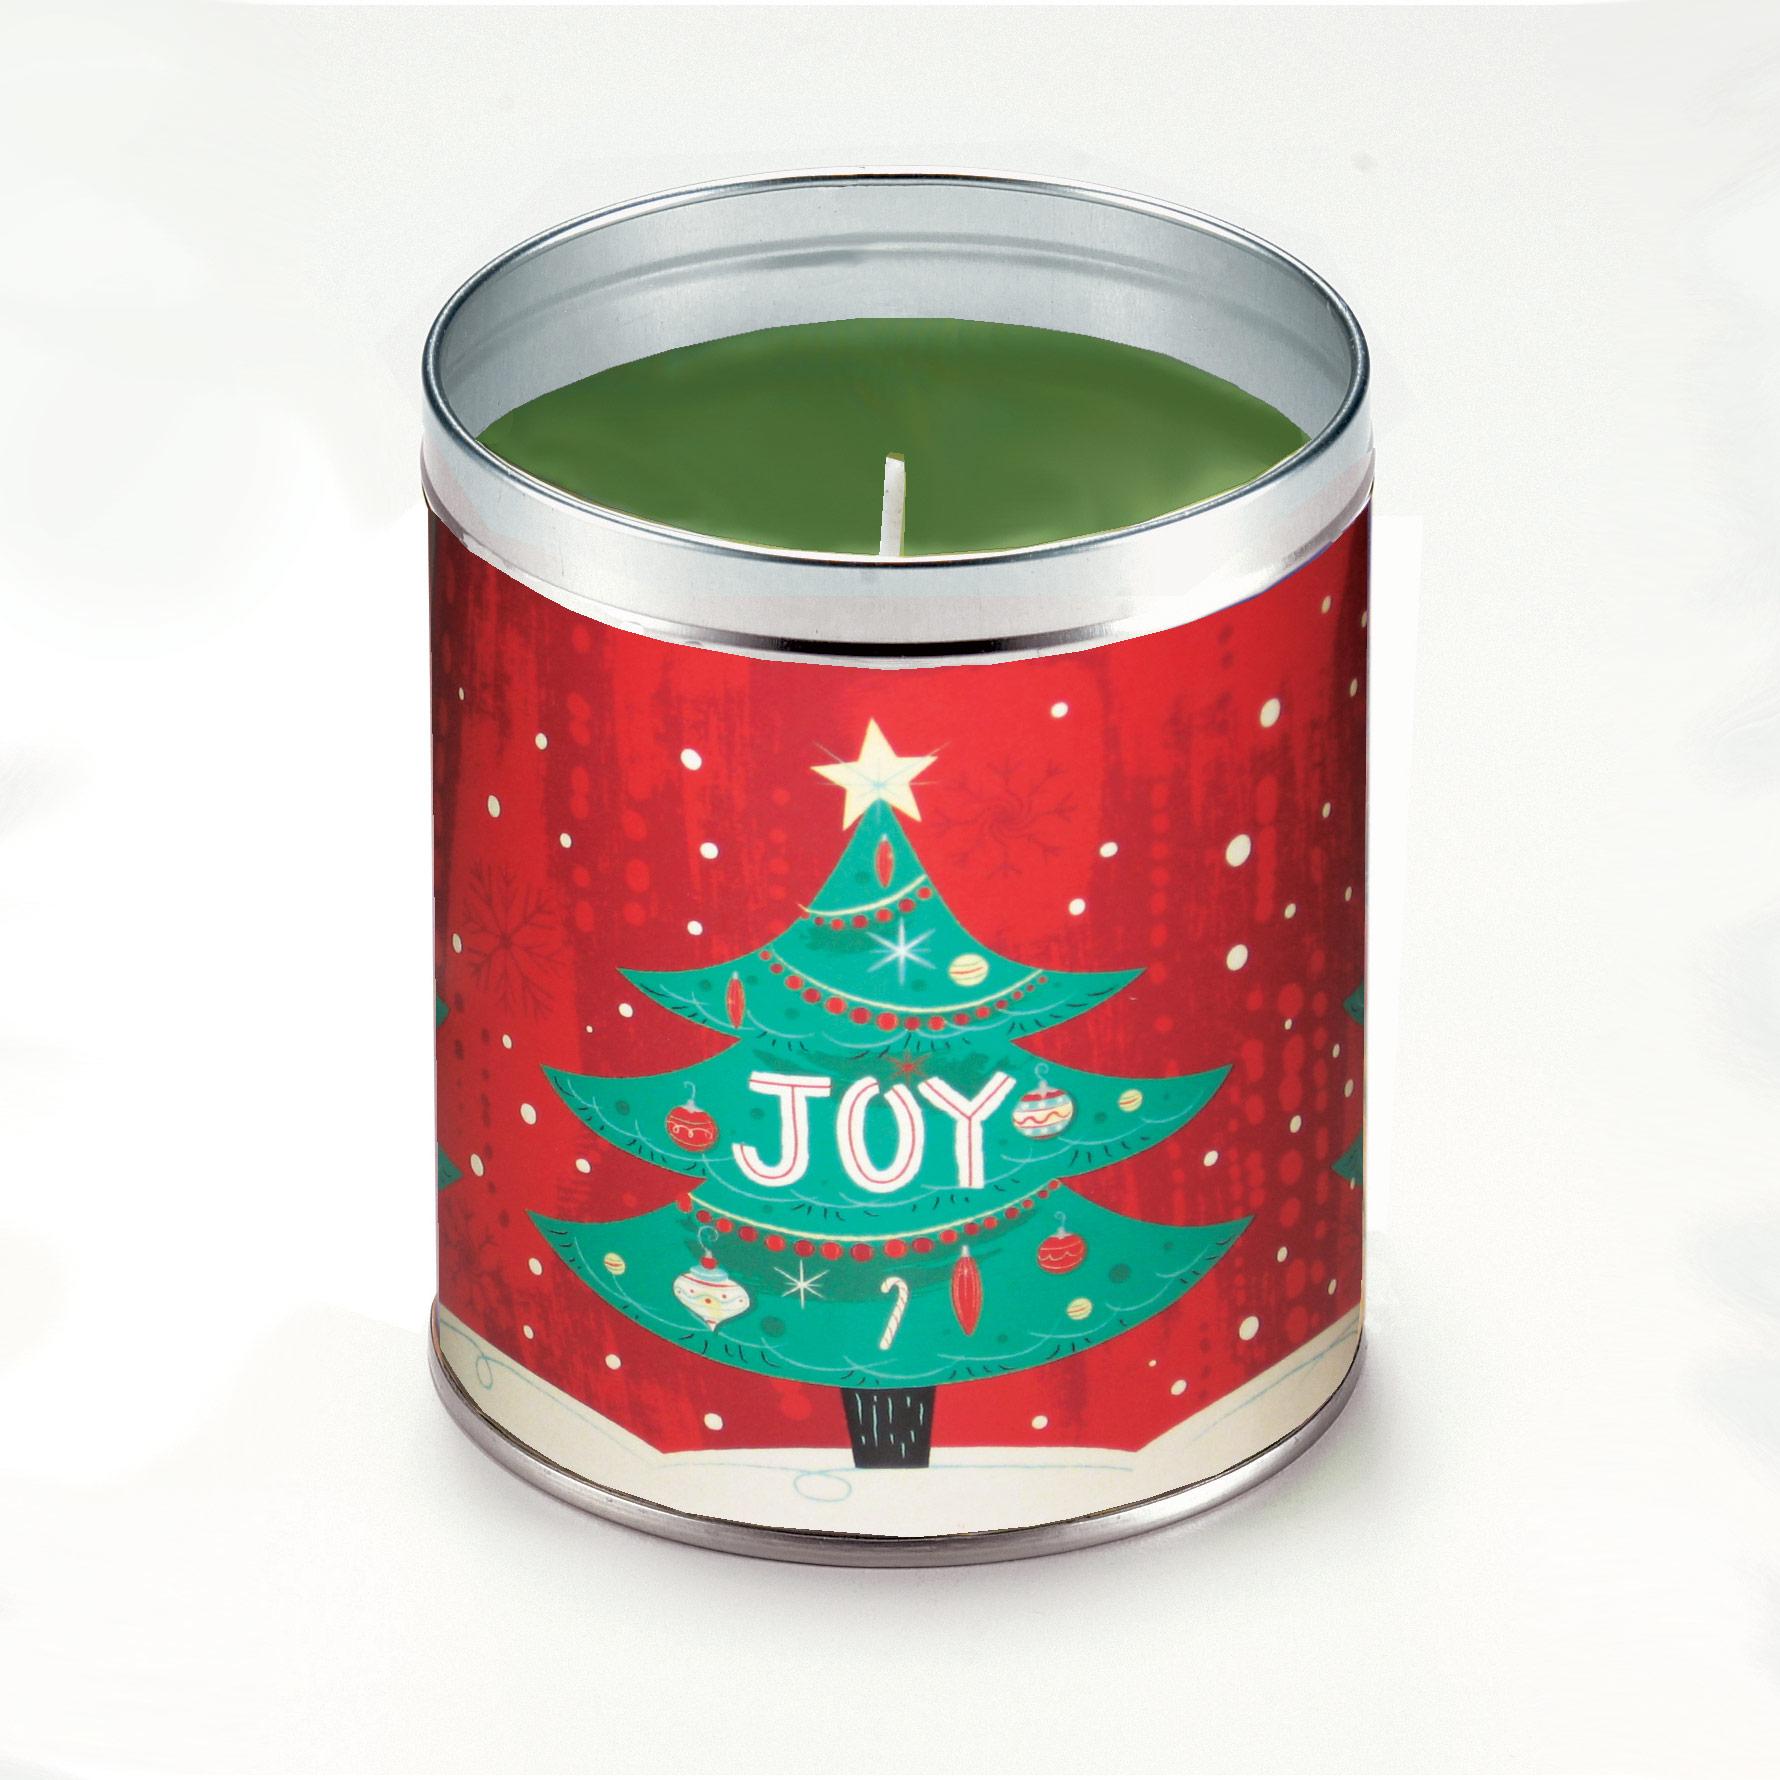 Aunt-Sadies-Johanna-Parker-joy-trees-candle.jpg